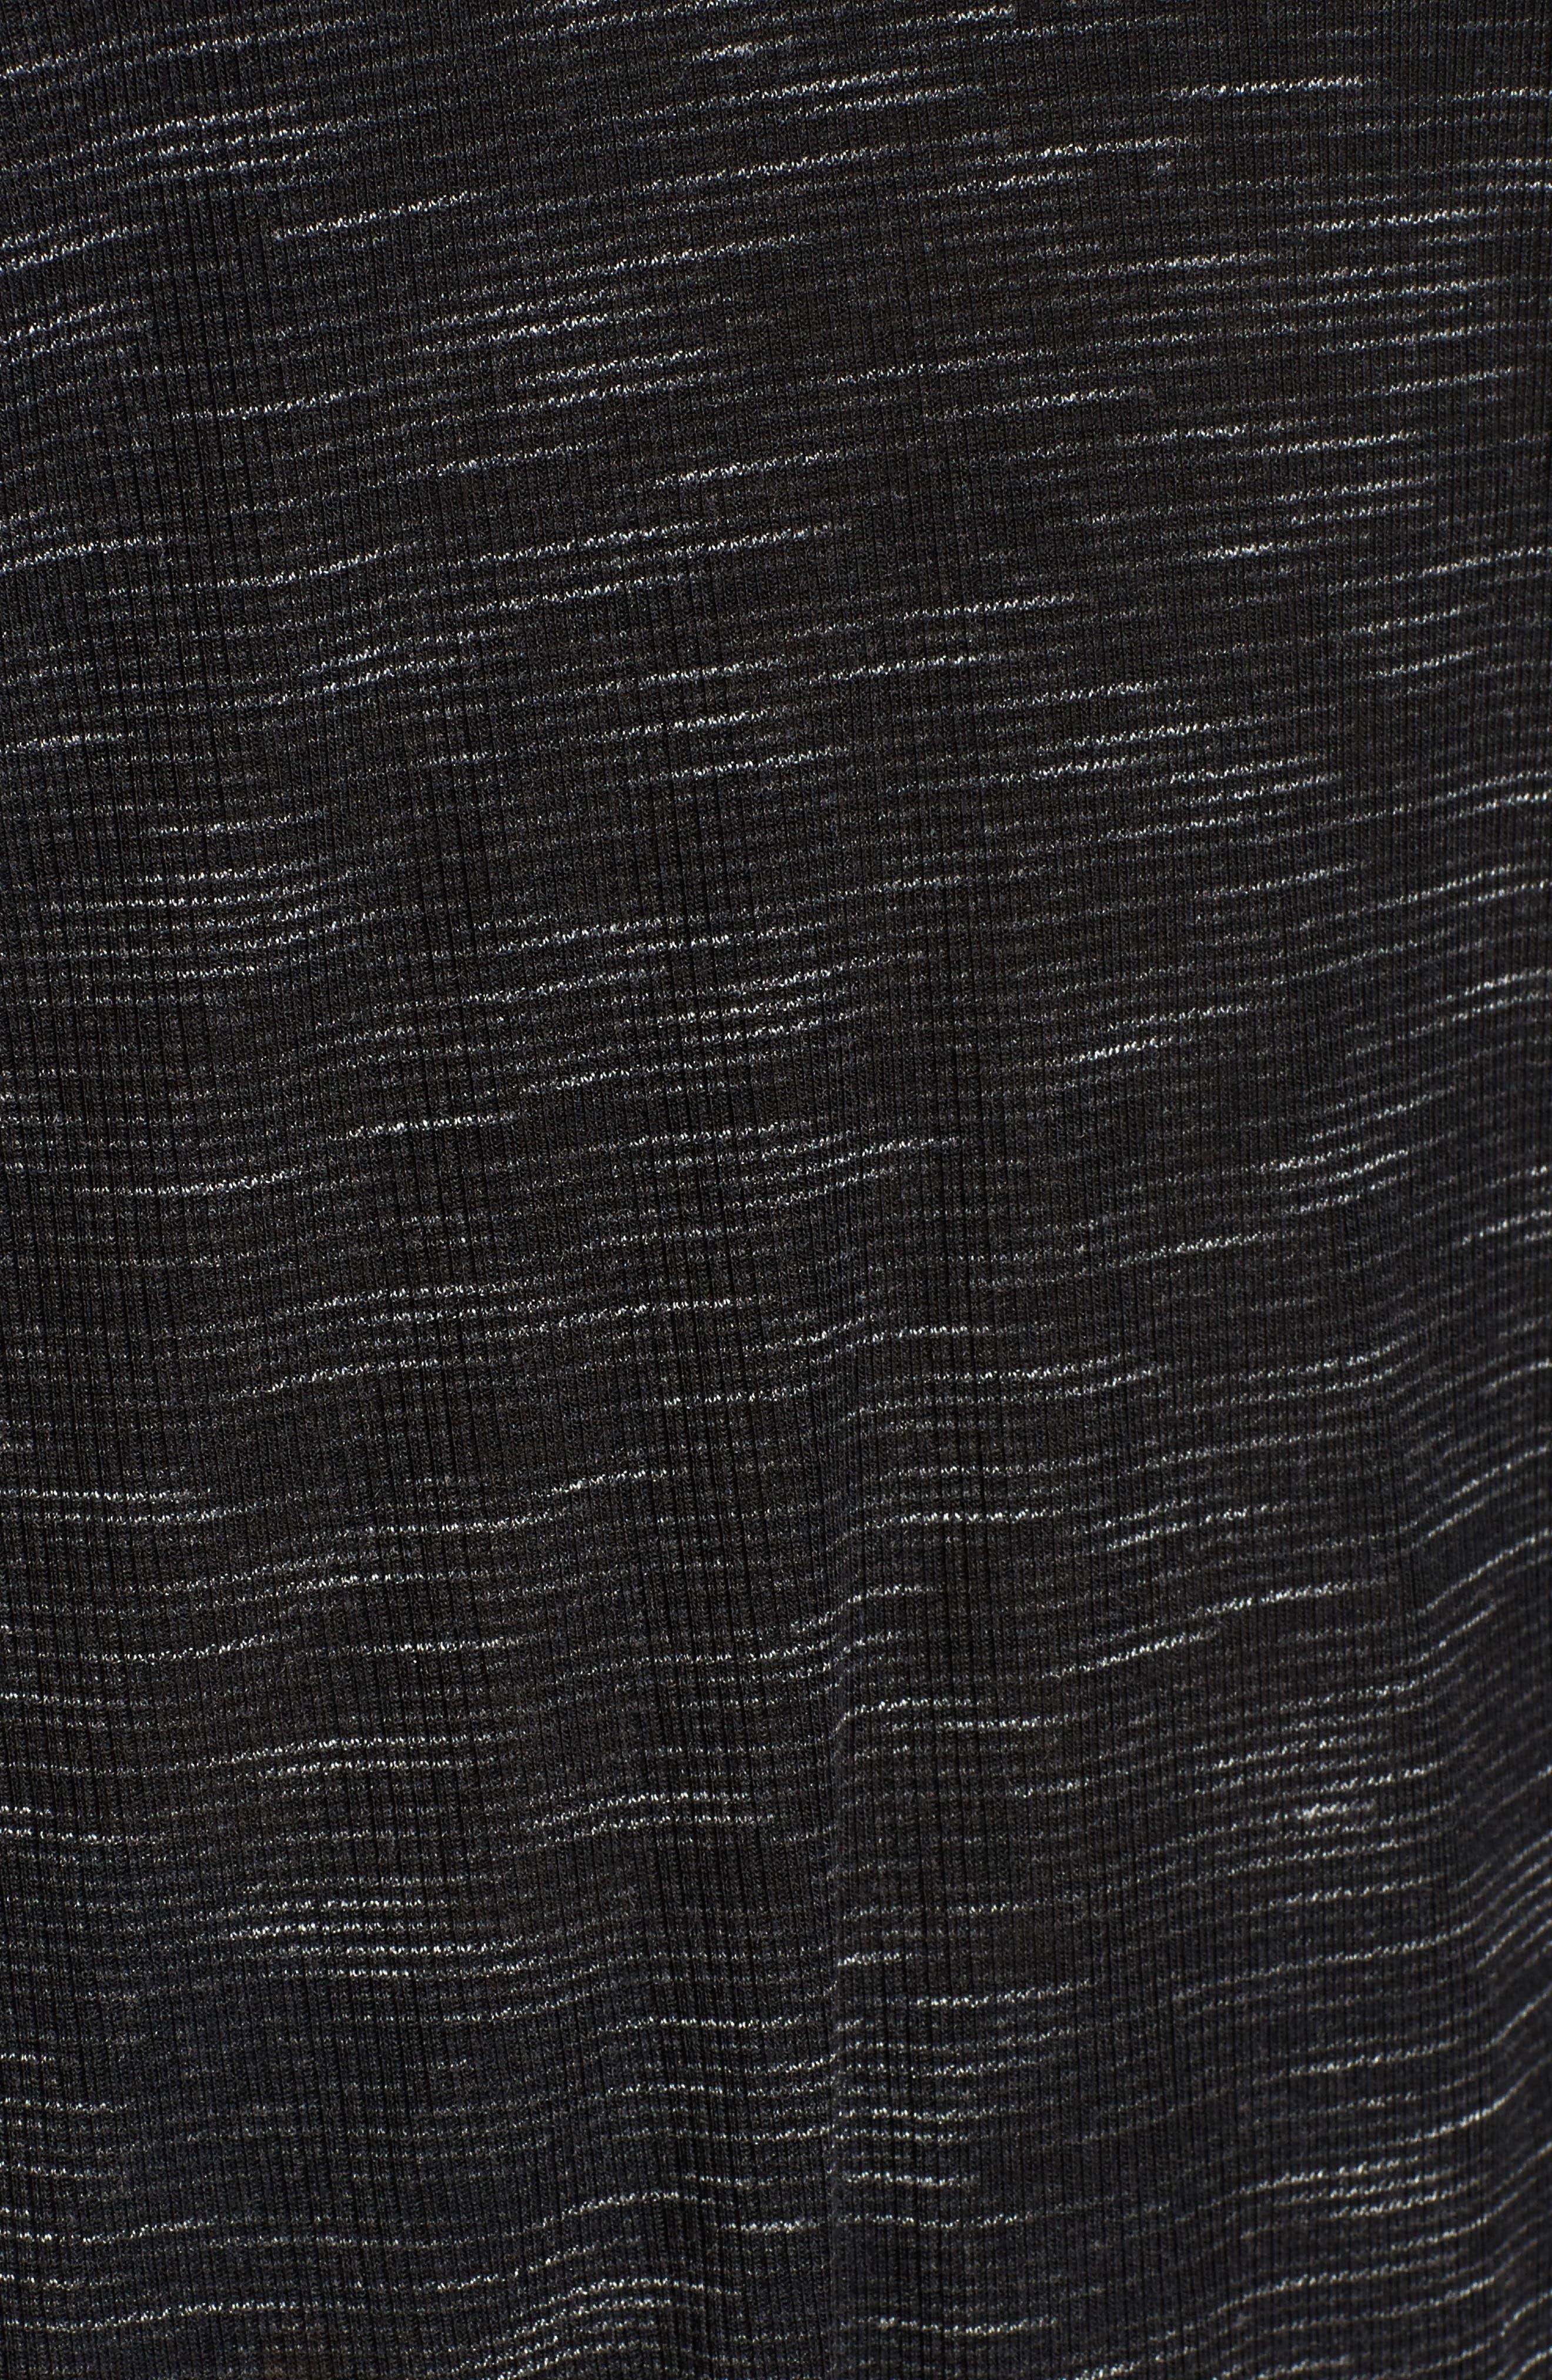 Scoop Neck Space Dye Tee,                             Alternate thumbnail 5, color,                             Black (W/ White Space Dye)